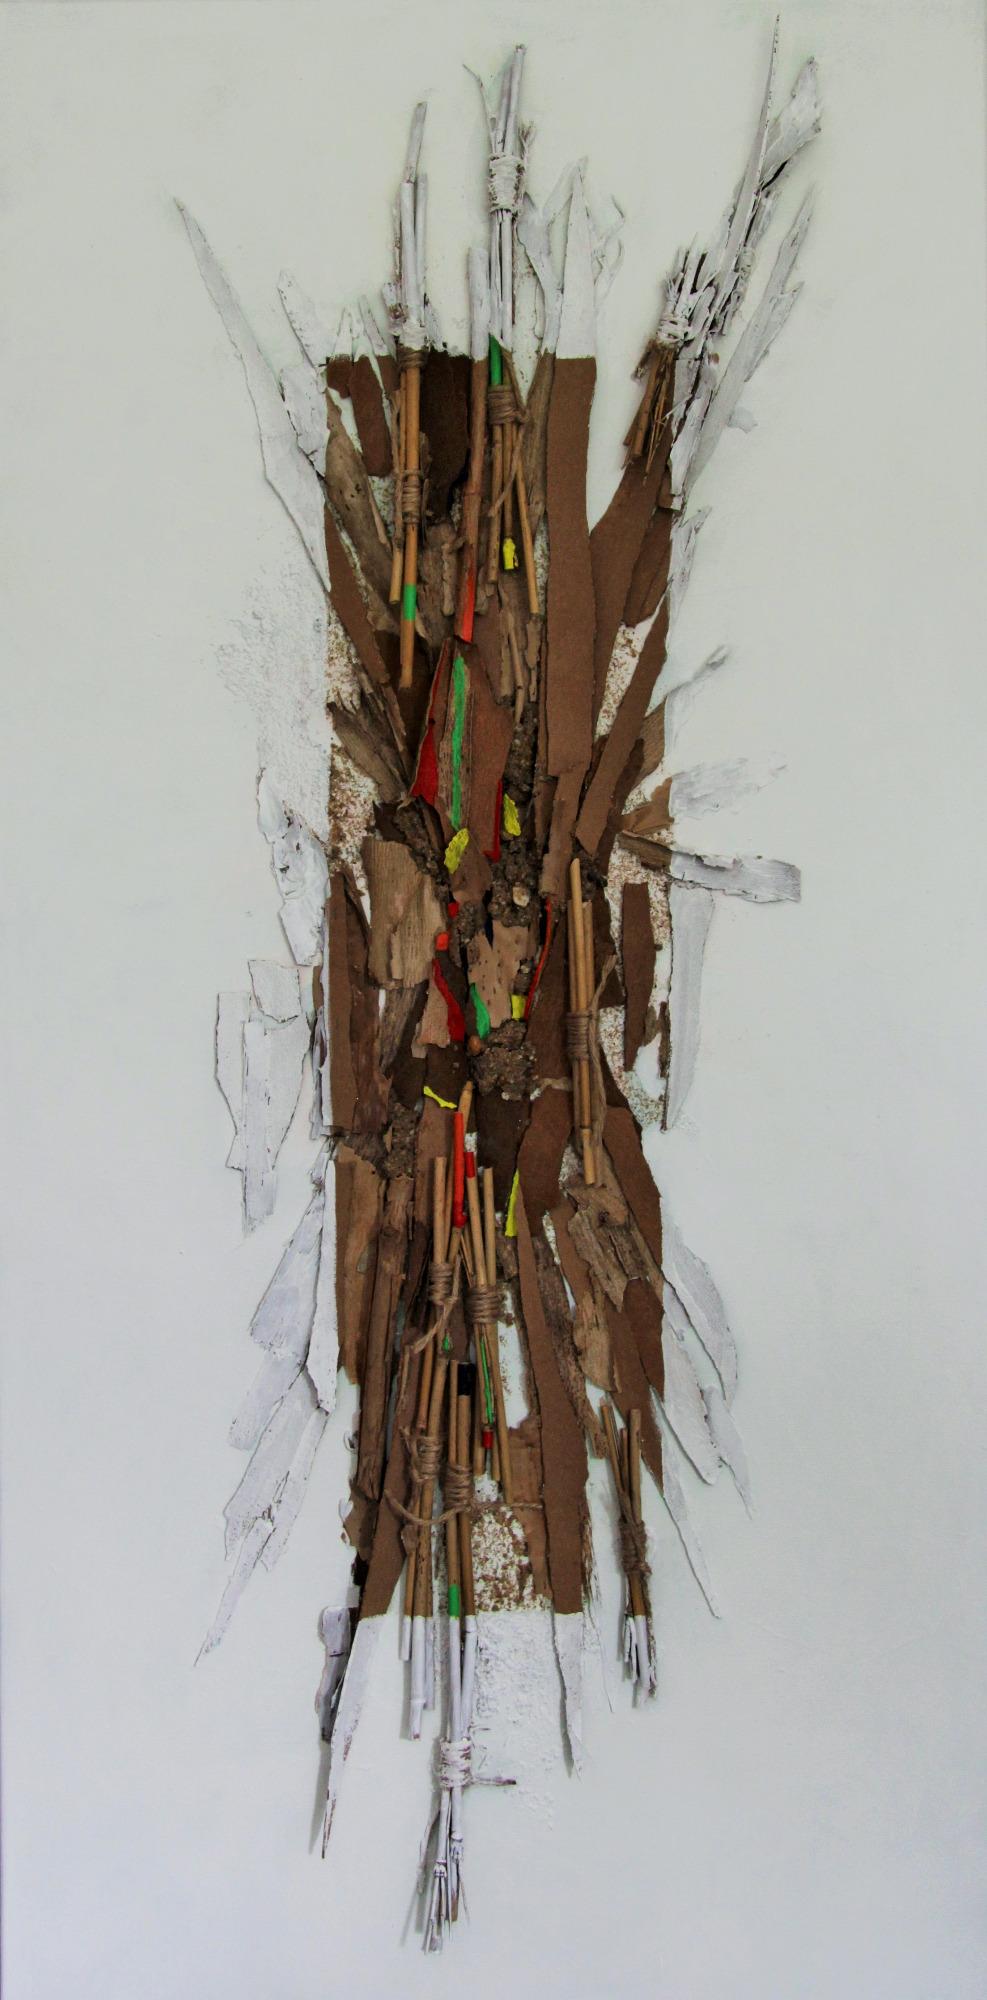 Rinde, Bambus, Sisal…  2019, 50 x 100  Acryl / Naturmaterialien auf Leinwand